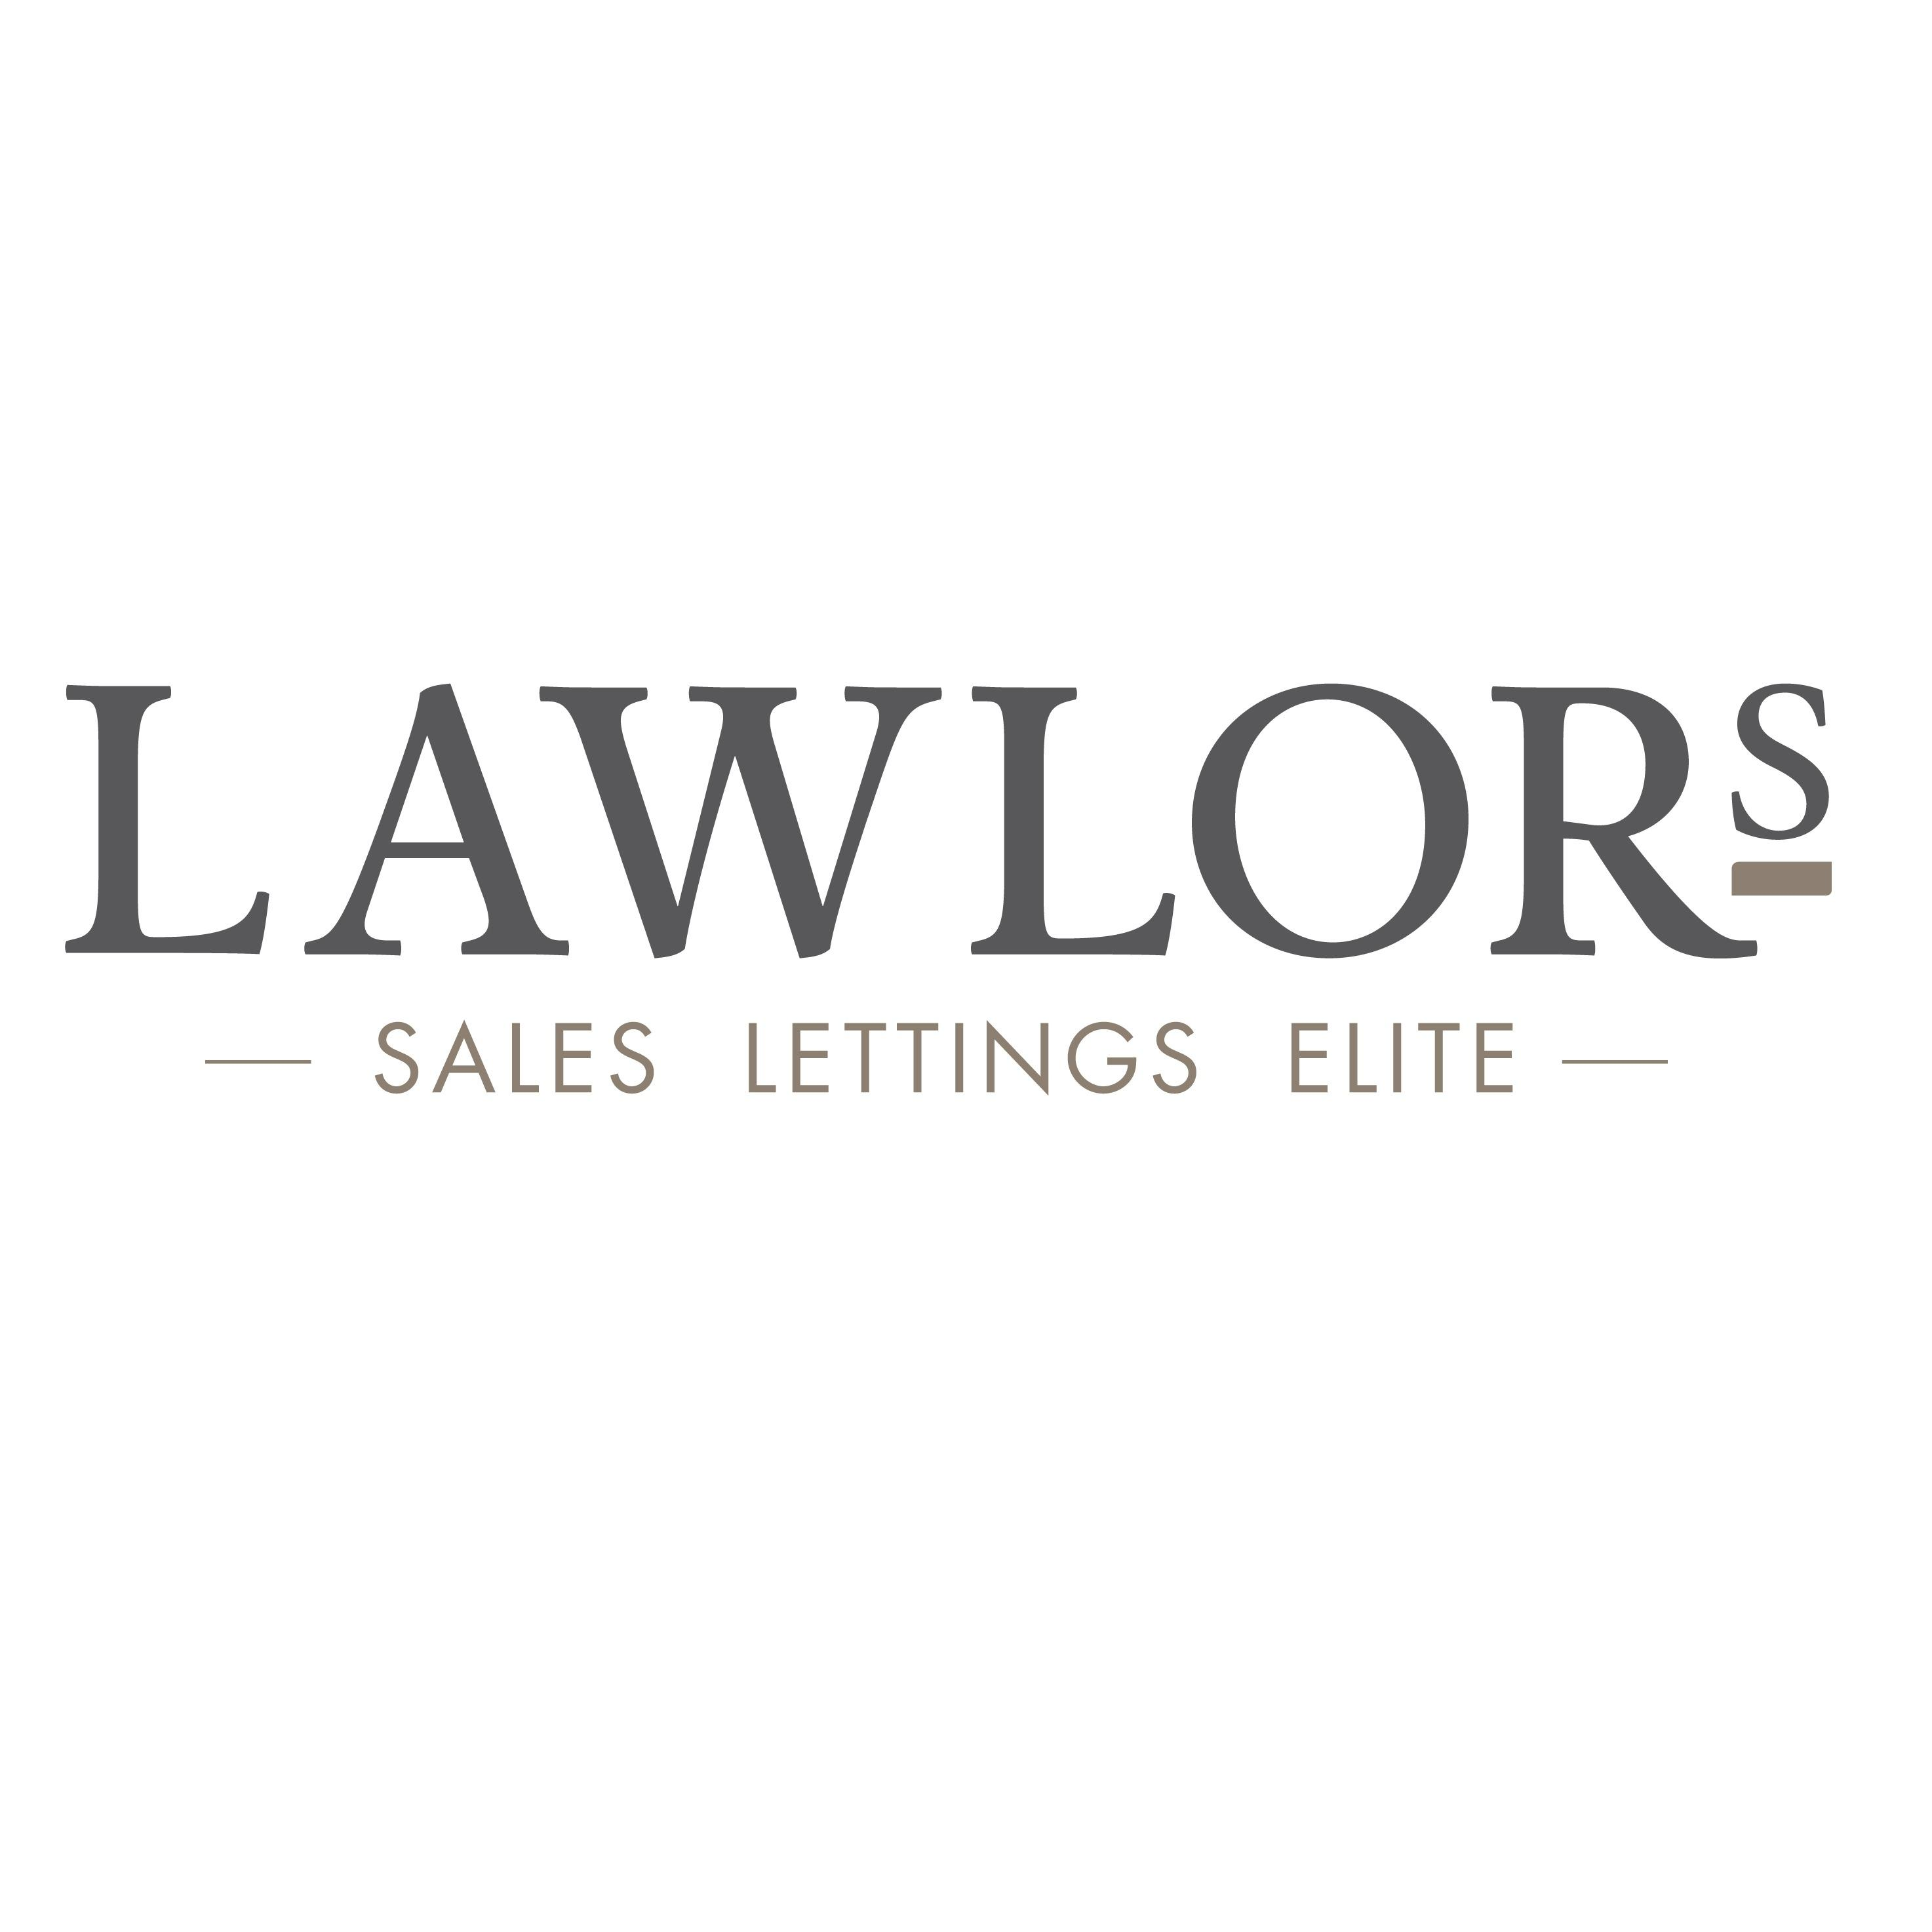 Lawlors Estate Agents Woodford - Woodford Green, London IG8 0XE - 020 8506 0828 | ShowMeLocal.com